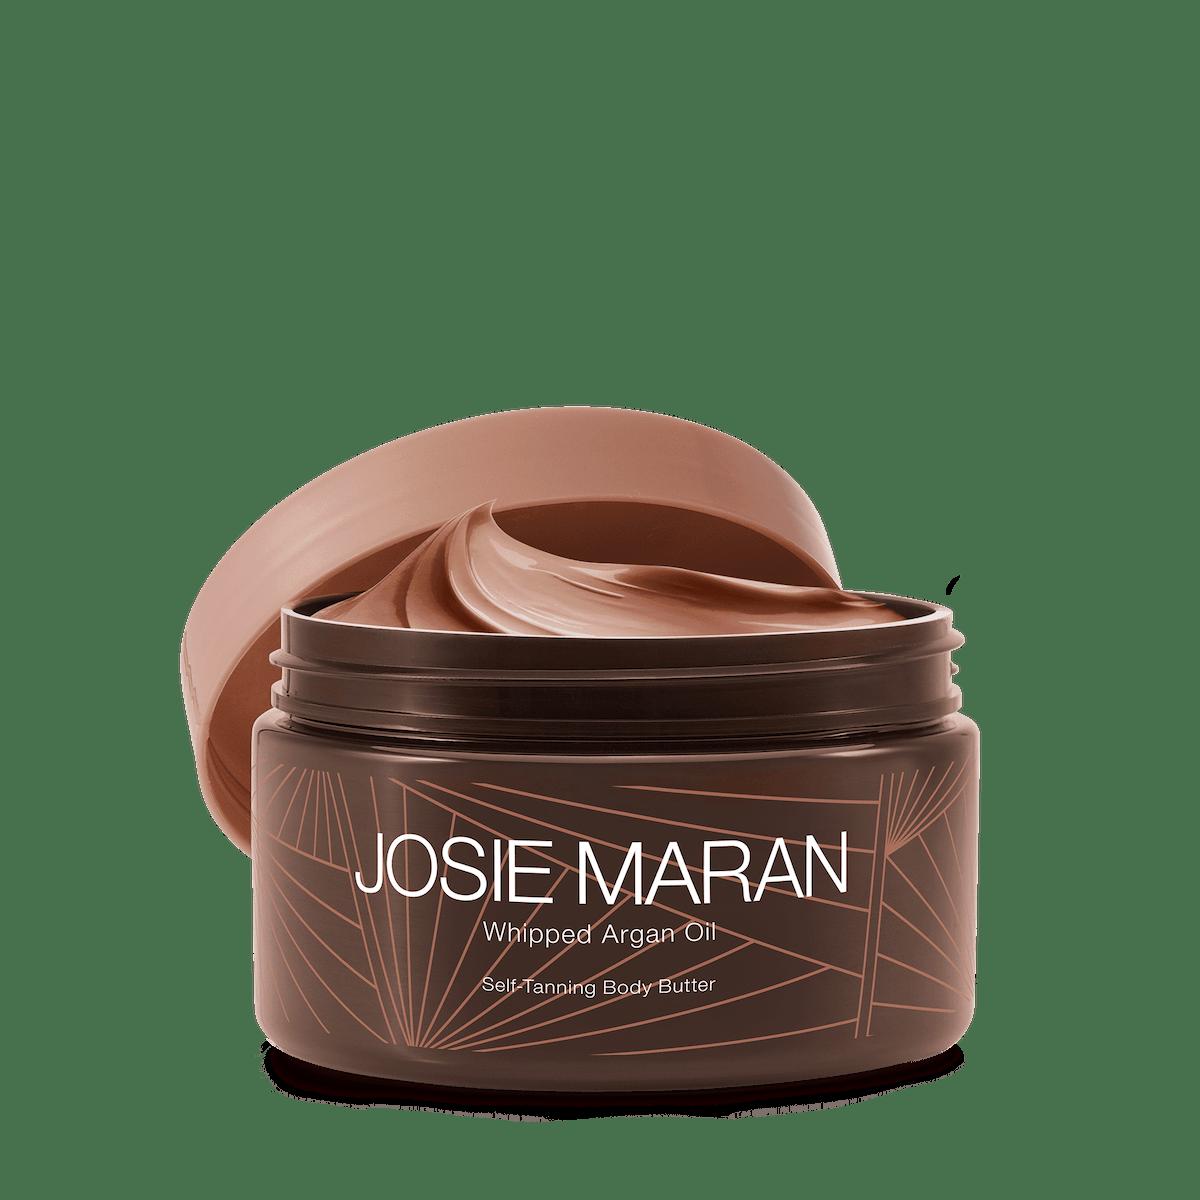 Whipped Argan Oil Self-Tanning Body Butter